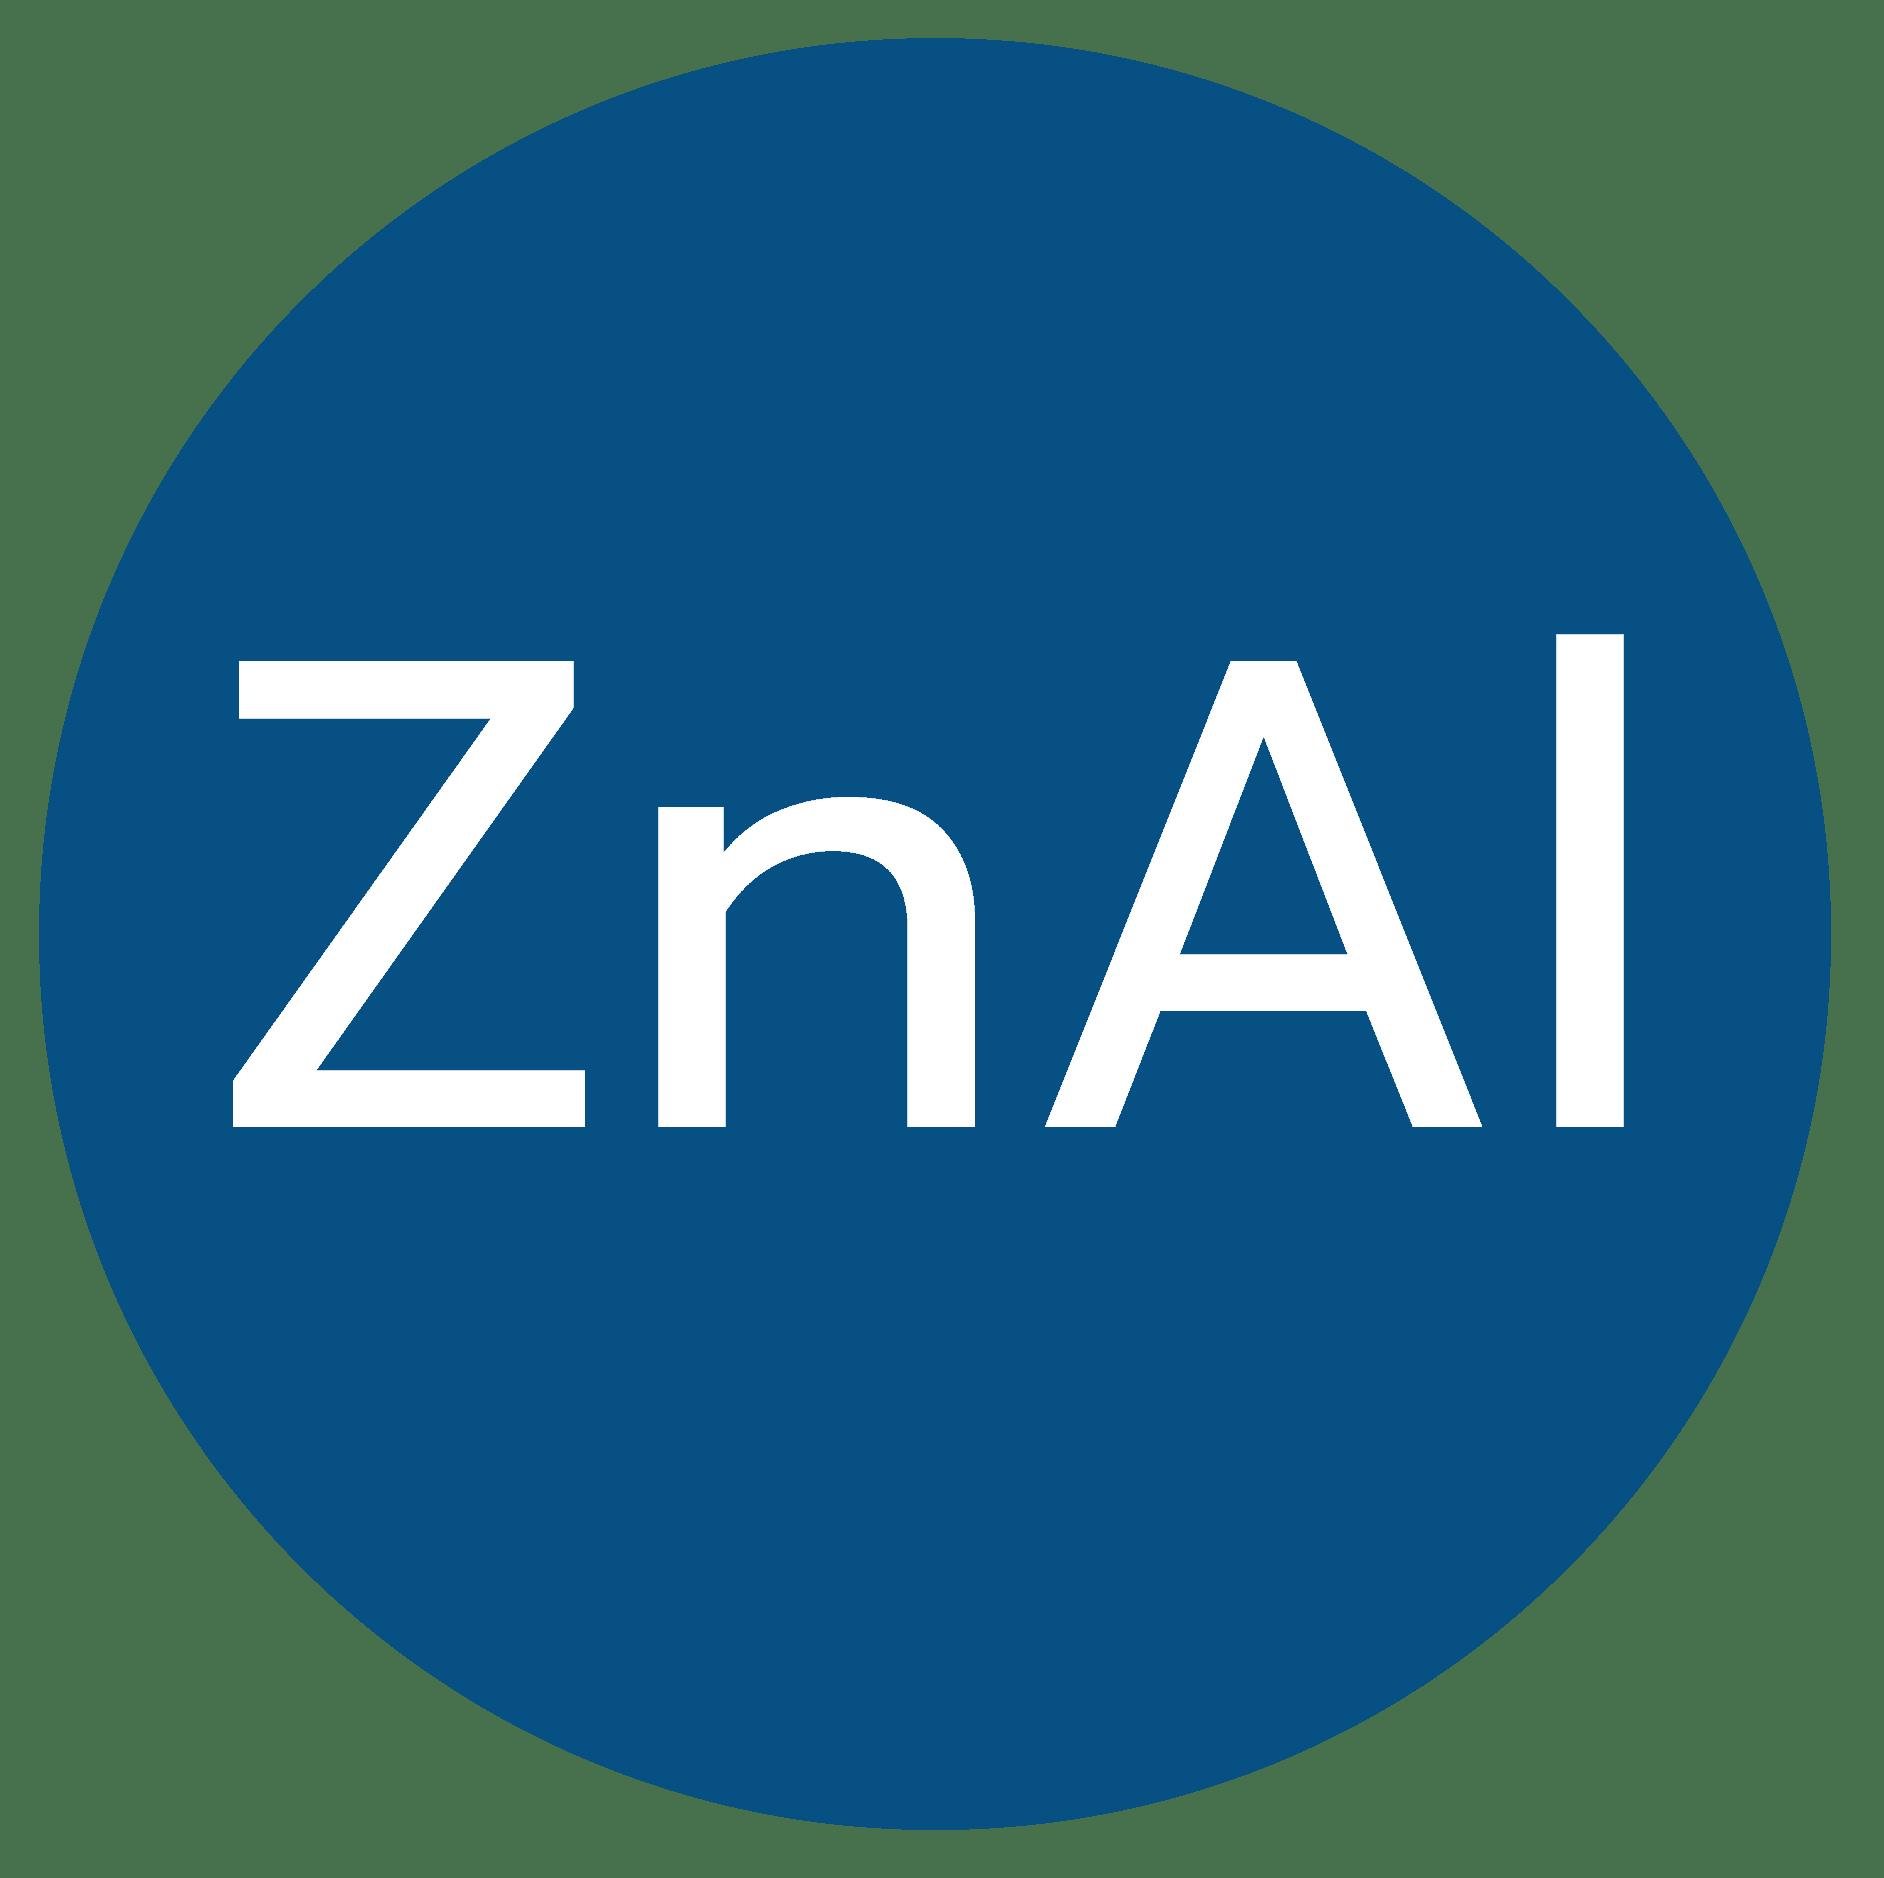 Icon ข้อดีรั้วตะแกรงเหล็ก ชุบซิงค์อลูหนาพิเศษ มาตรฐาน ASTM